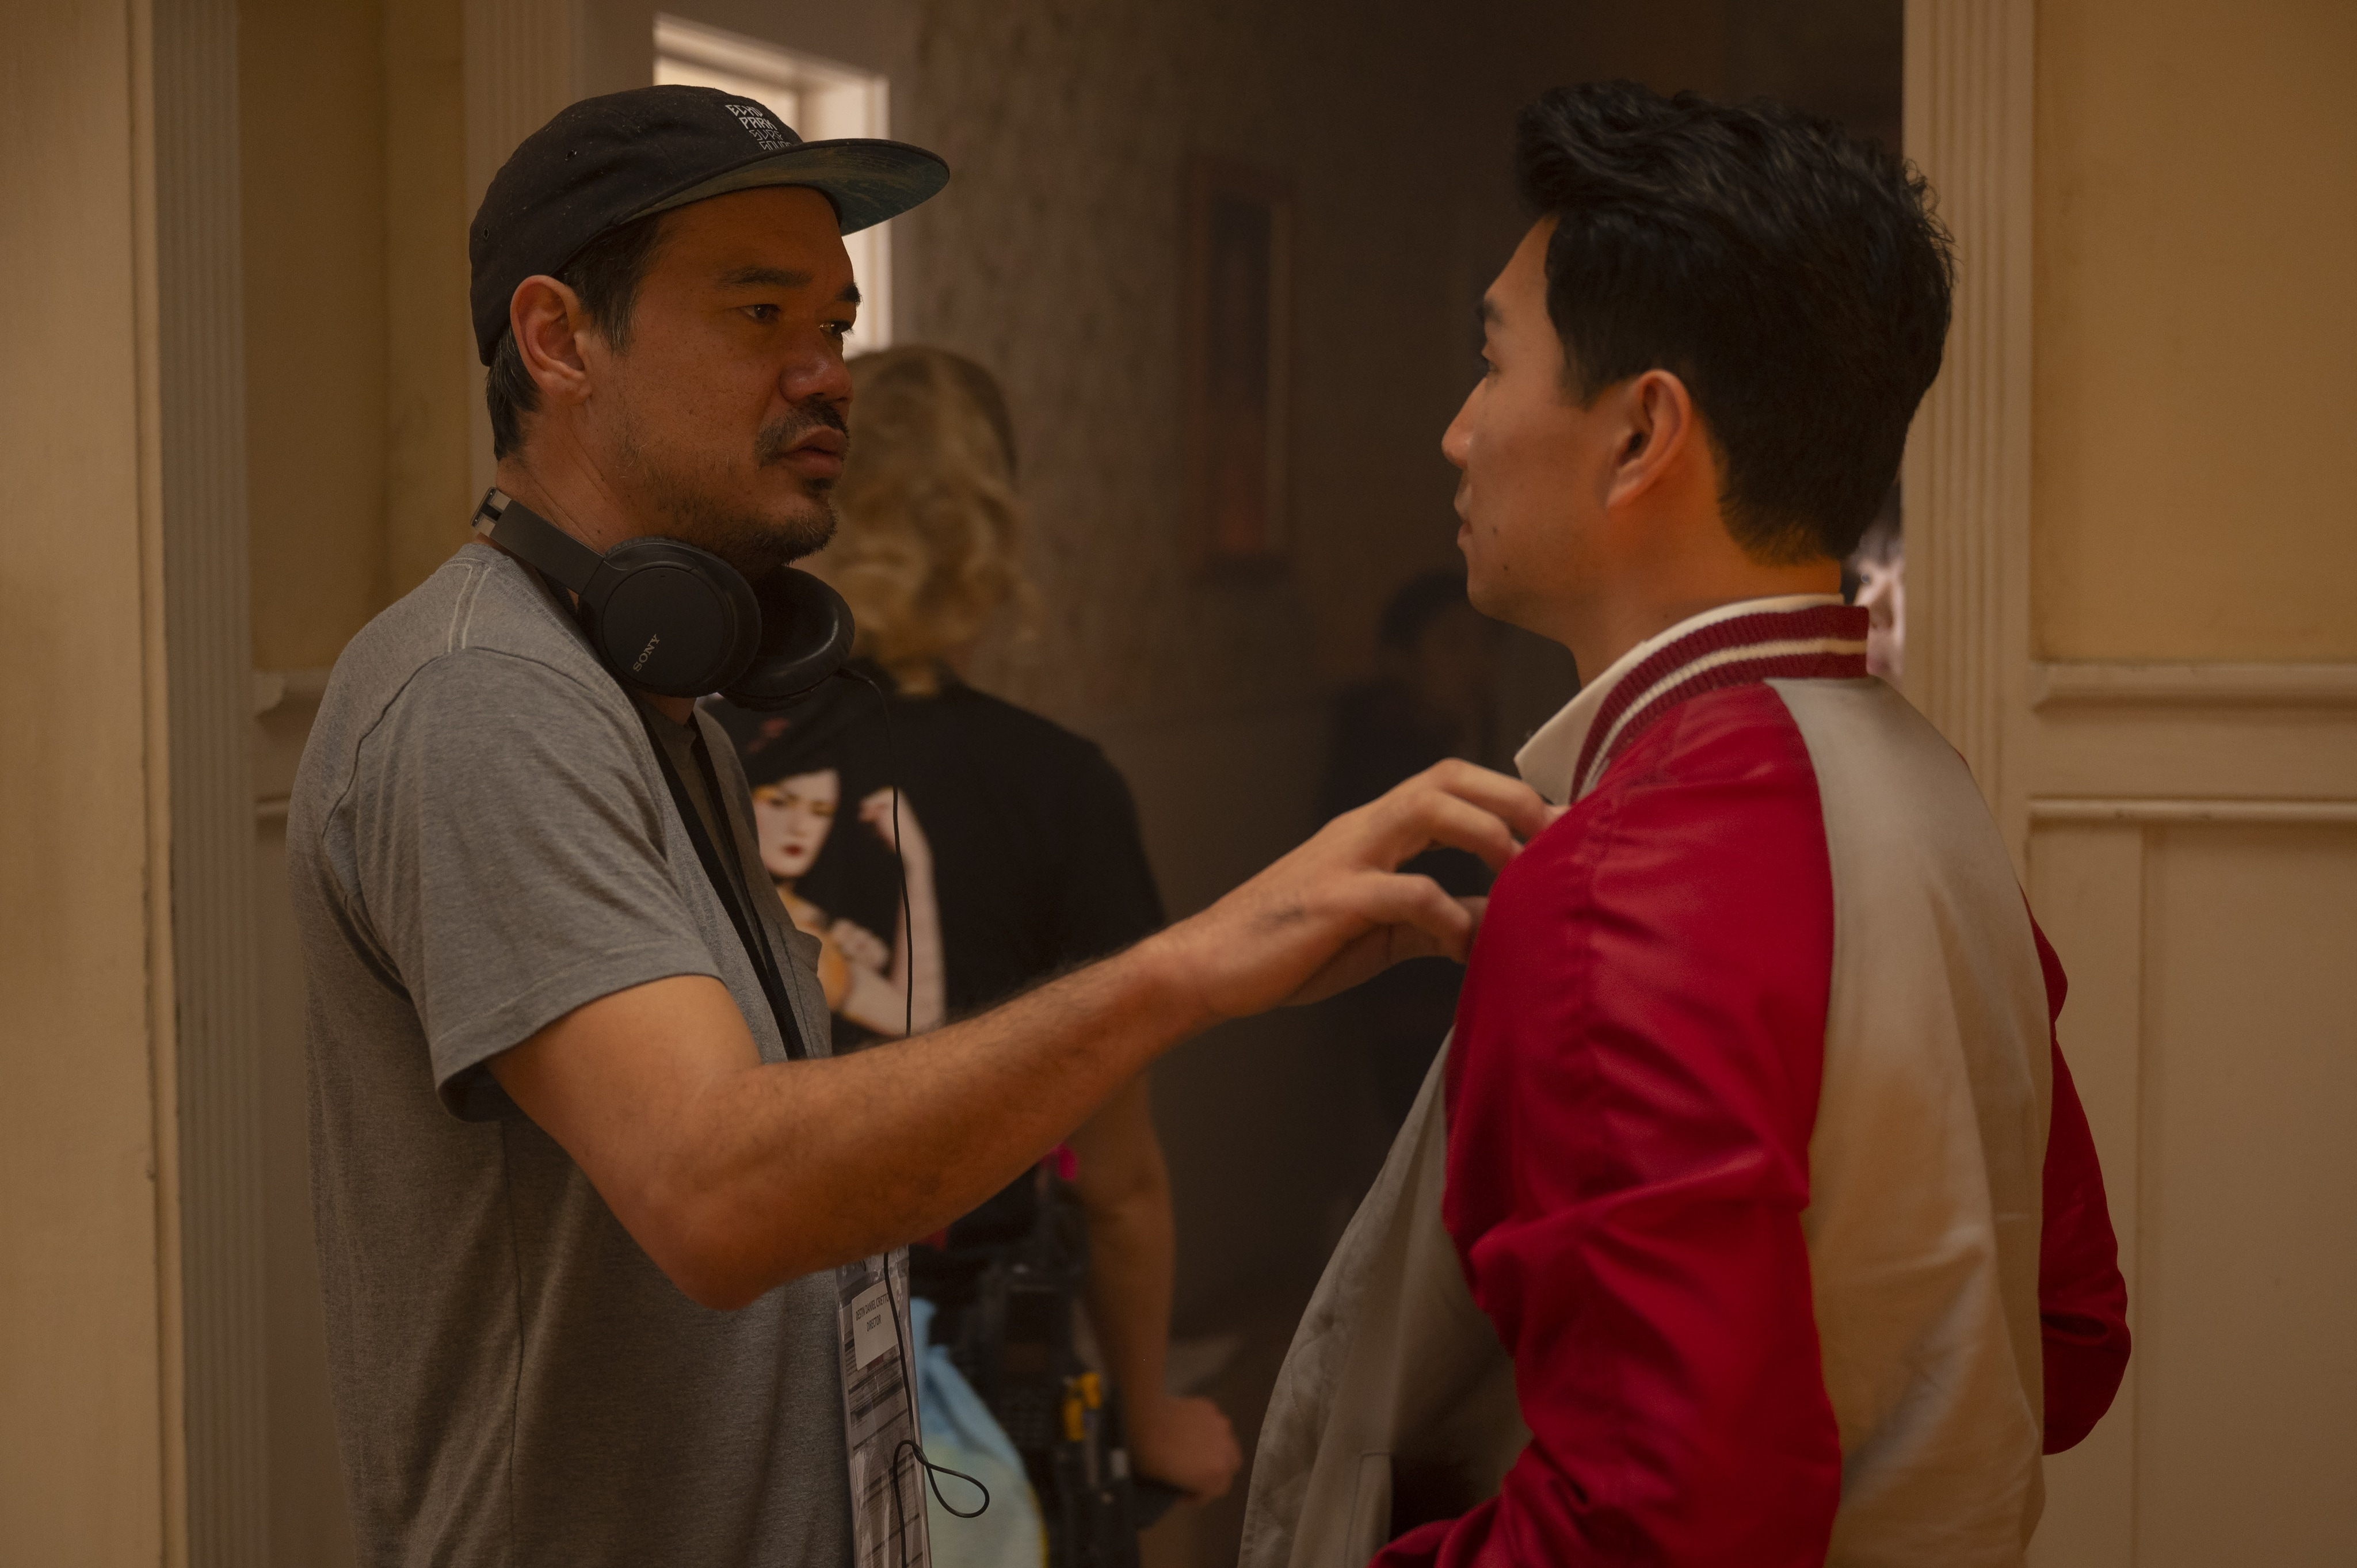 Director Destin Daniel Cretton talks with actor Simu Liu, who plays Shang-Chi, on set.